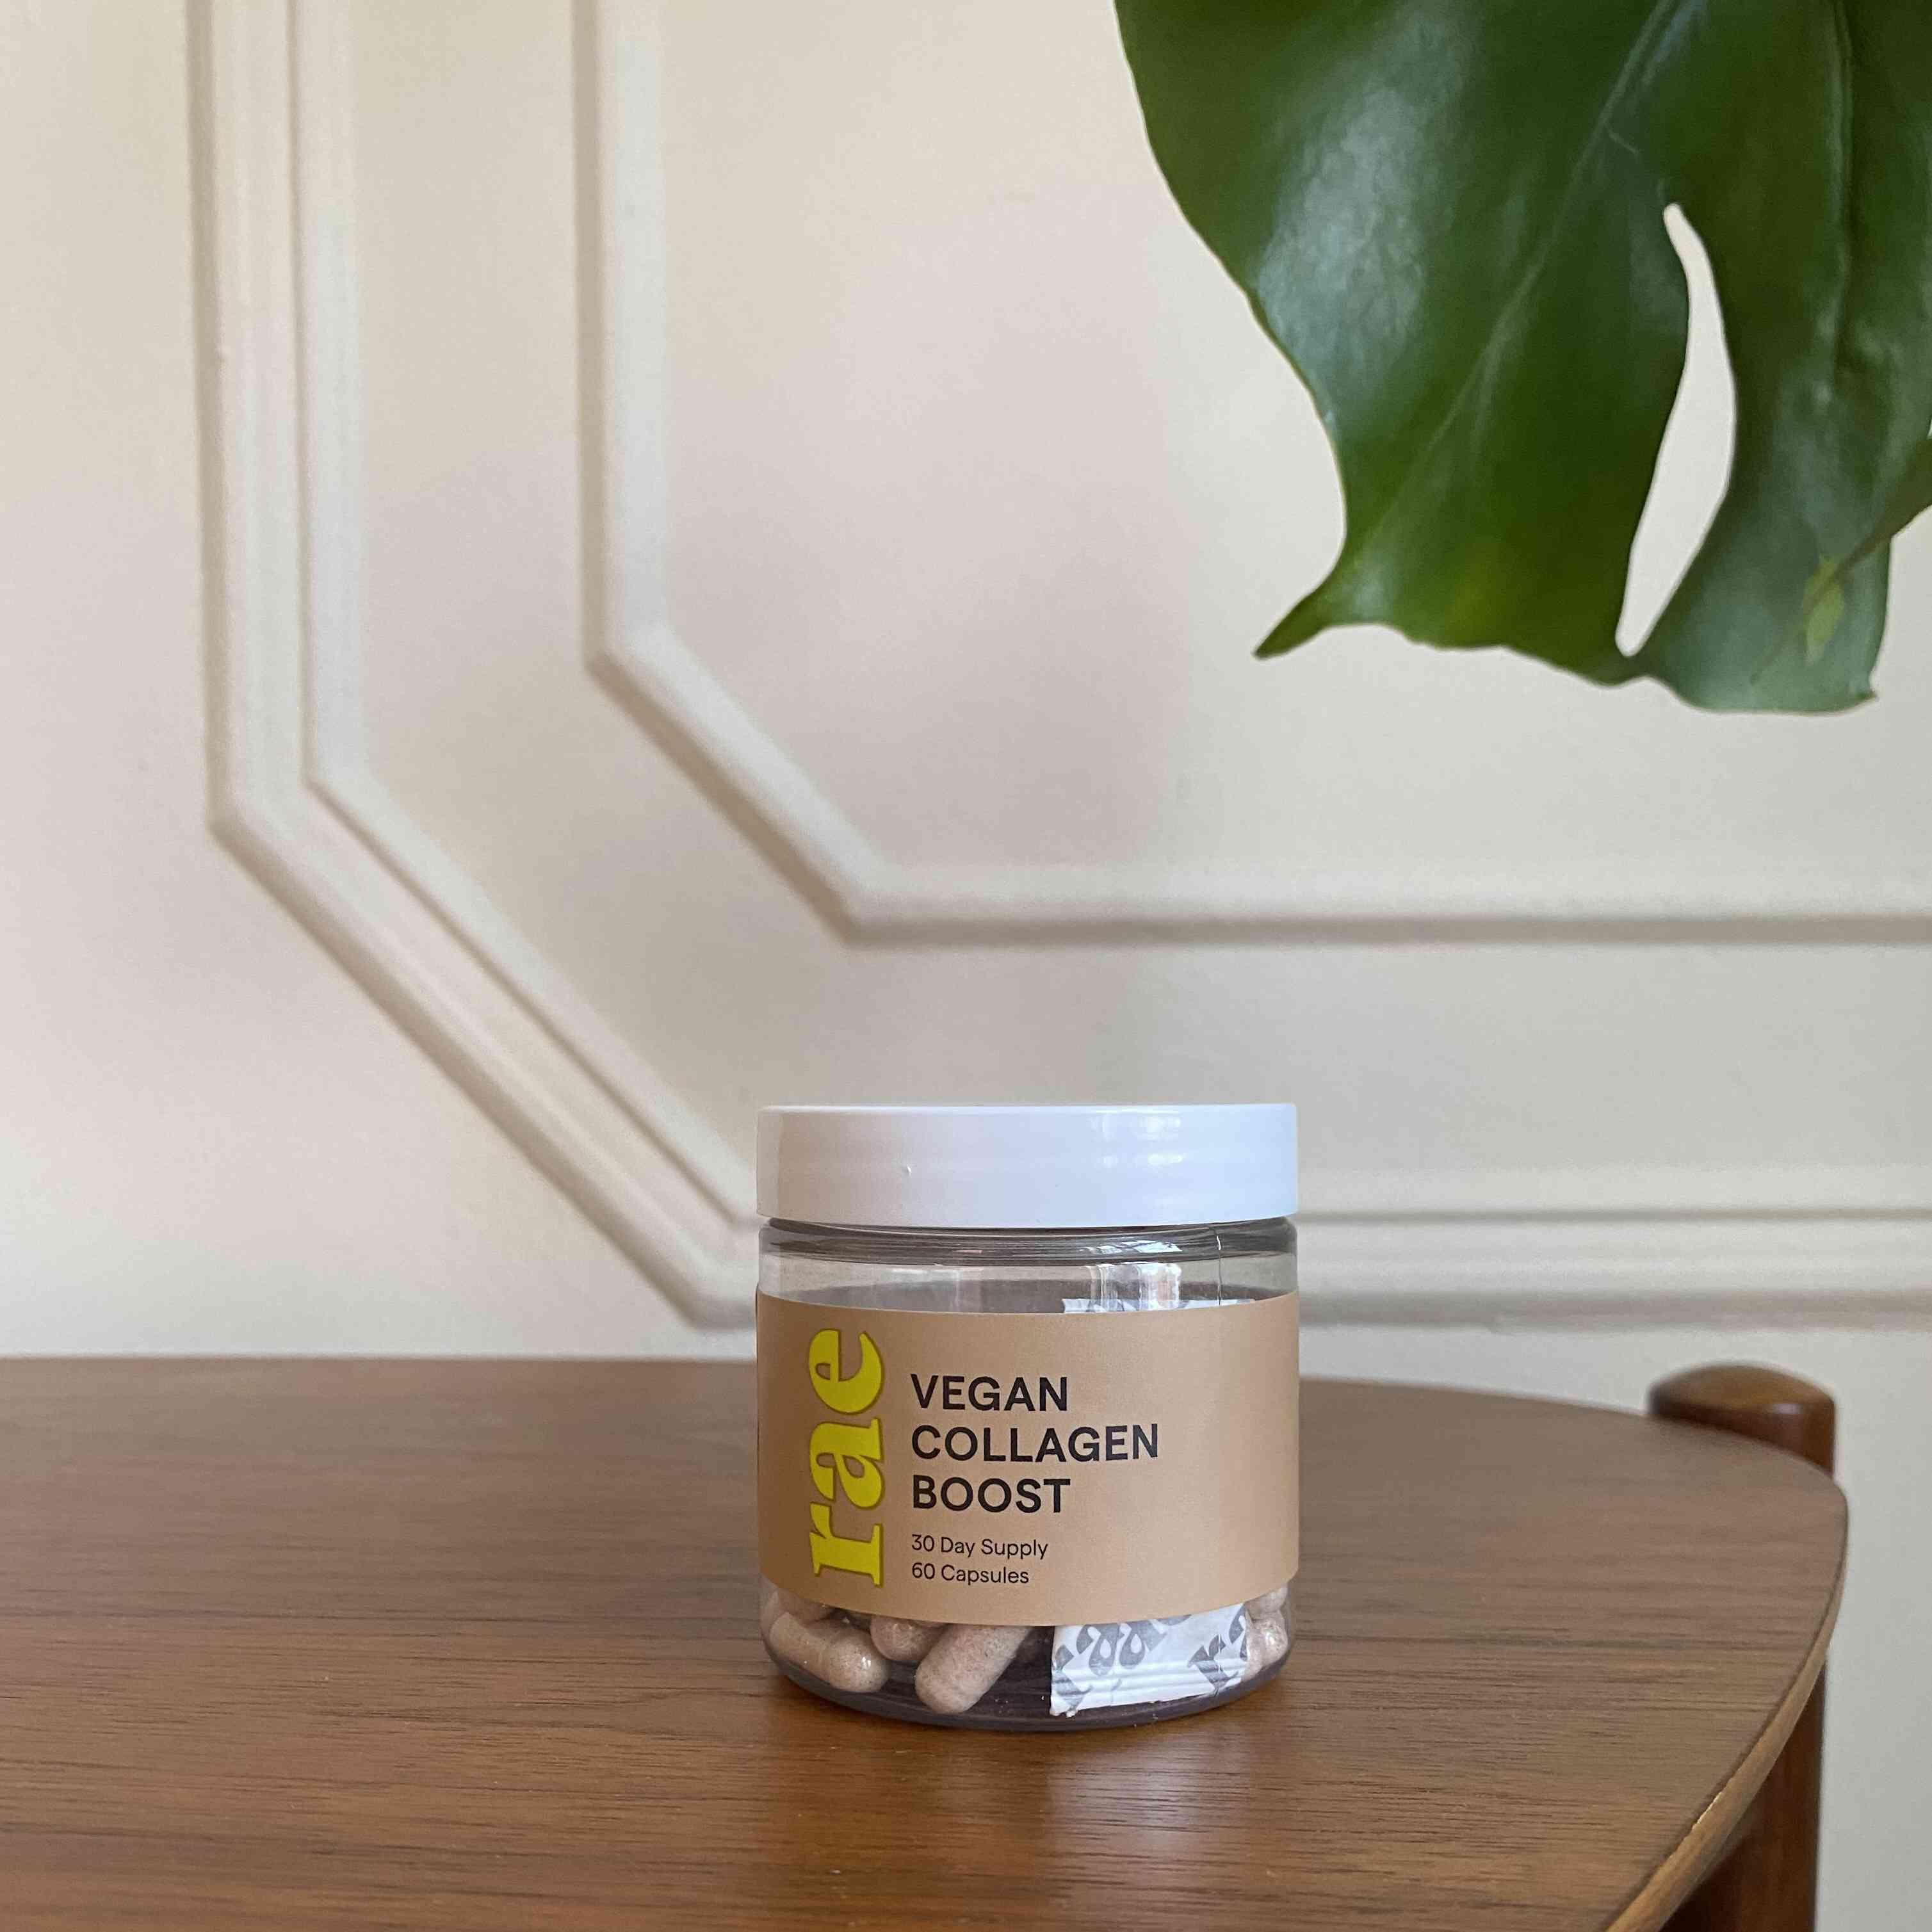 Rae Wellness Vegan Collagen Boost